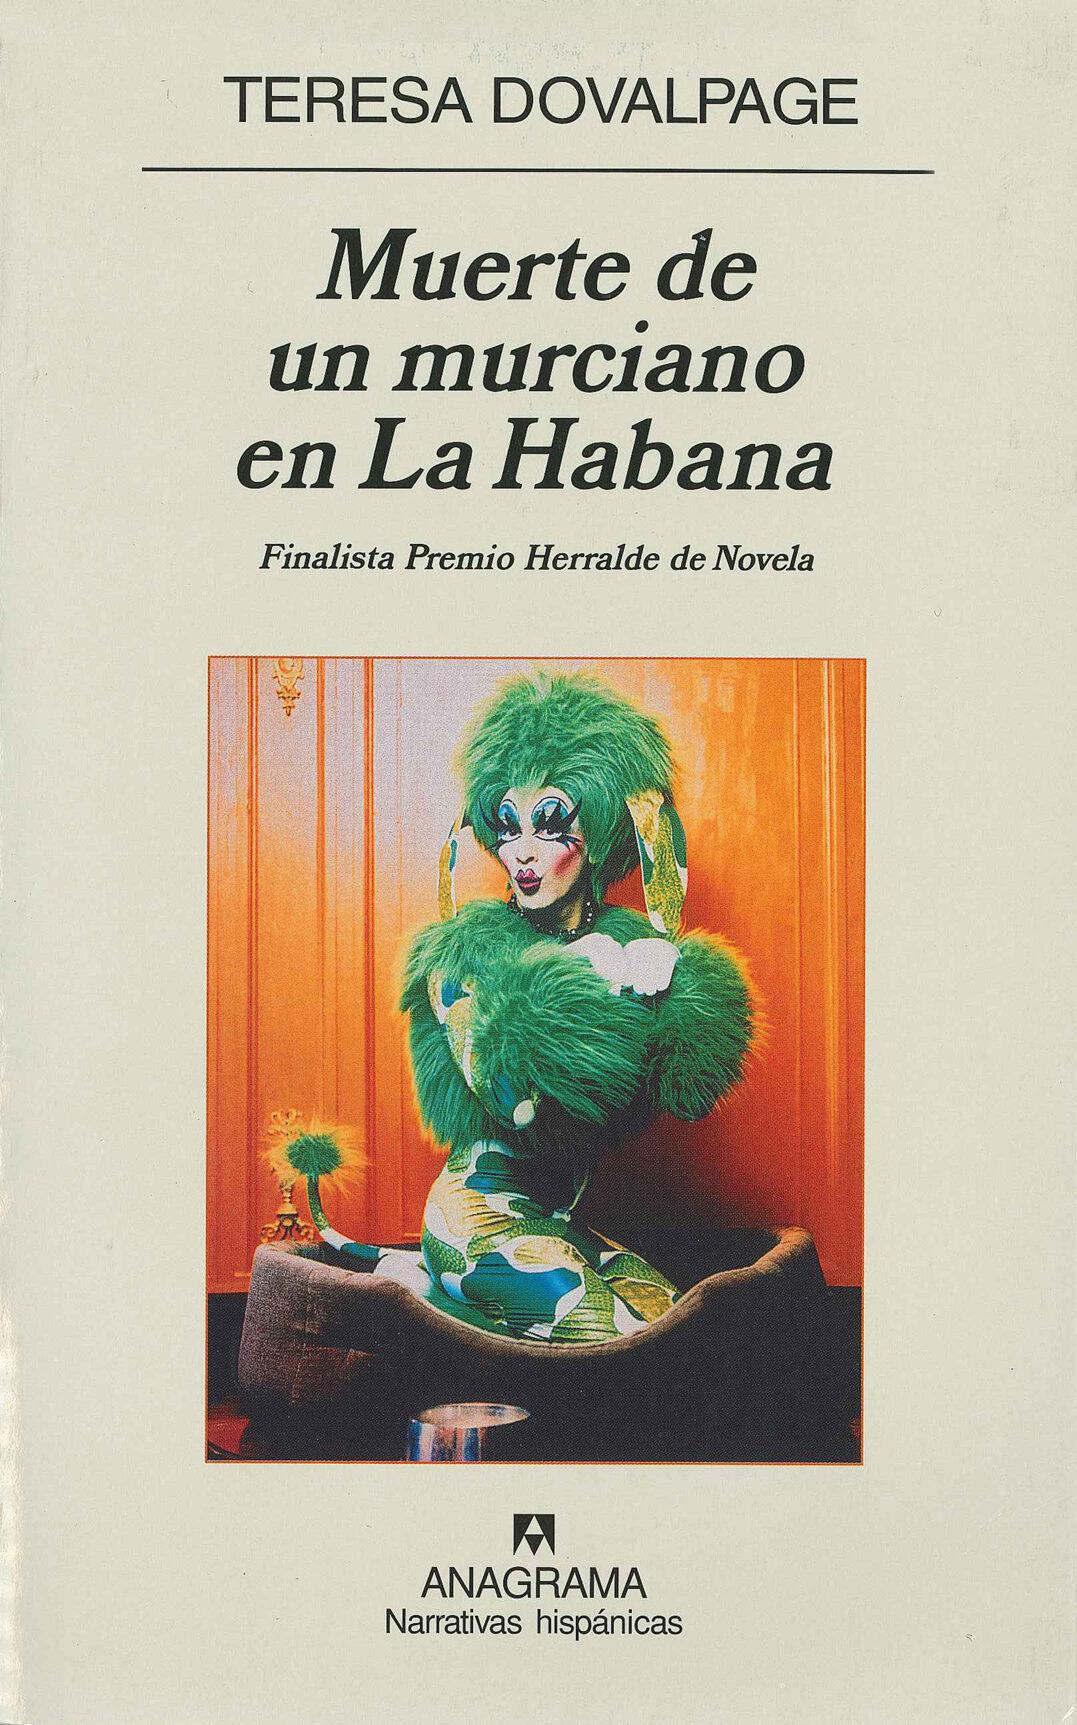 muerte de un murciano en la habana (finalista premio herralde de novela 2006)-teresa dovalpage-9788433971418